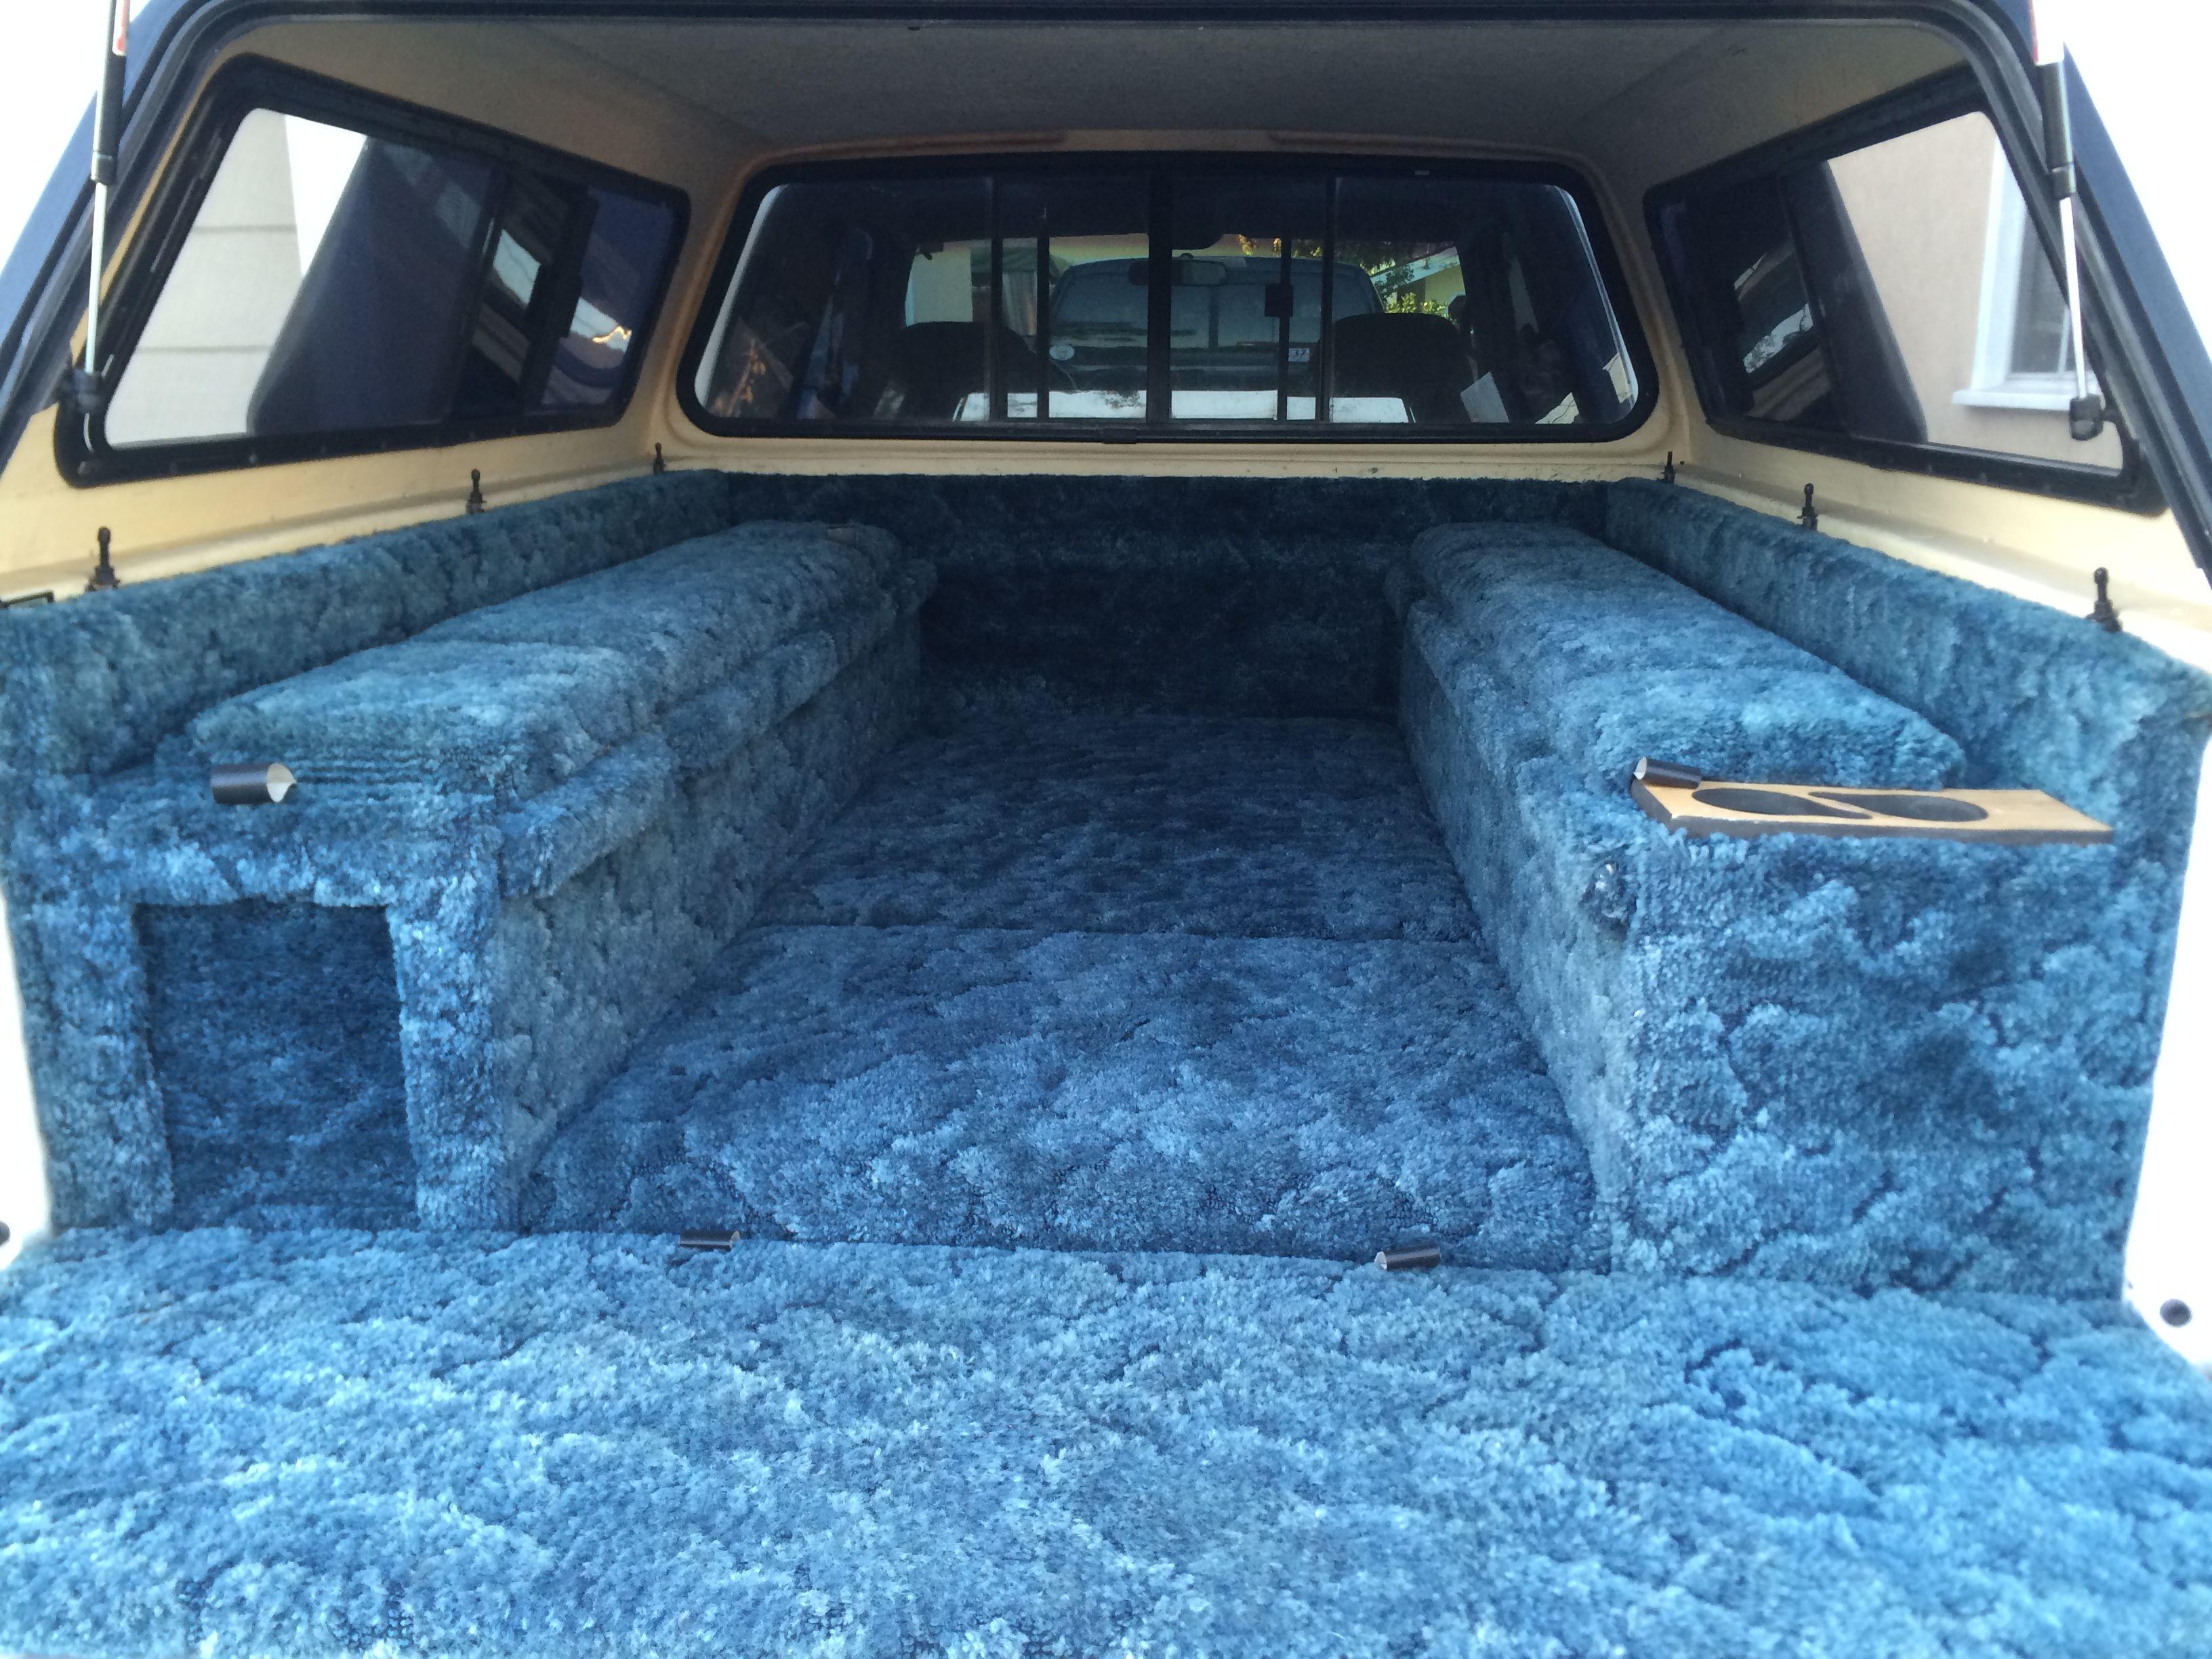 25 Year Old Lee Anderson Custom Carpet Kit Truck Camping Custom Carpet 25 Years Old